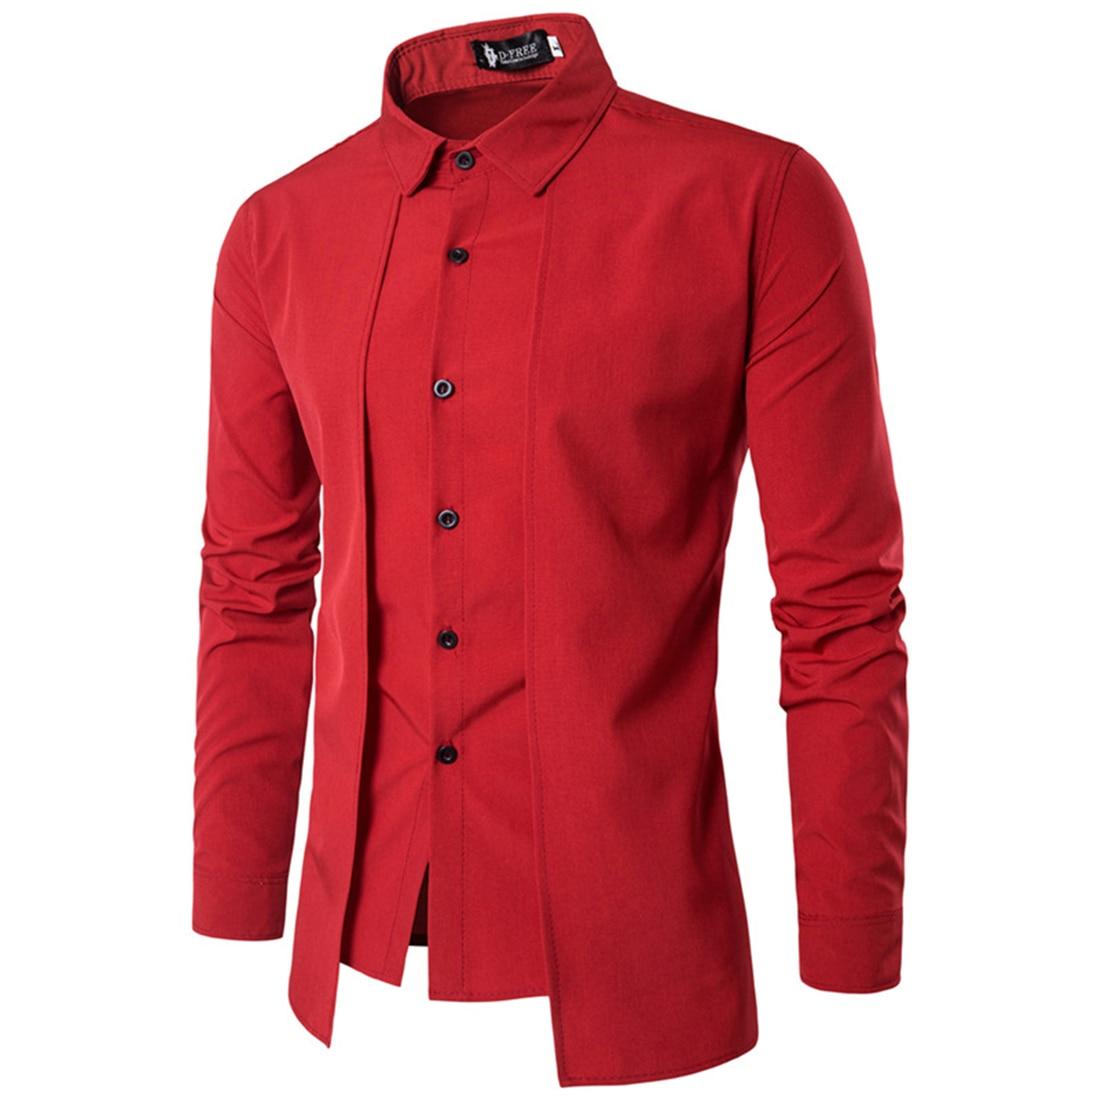 Rosso Nero Bianco Blu Camicia Uomo Manica Lunga Patchwork Tuxedo Camicie Estate Monopetto Irregolare Dress Shirts 2017 Falso 2 PZ